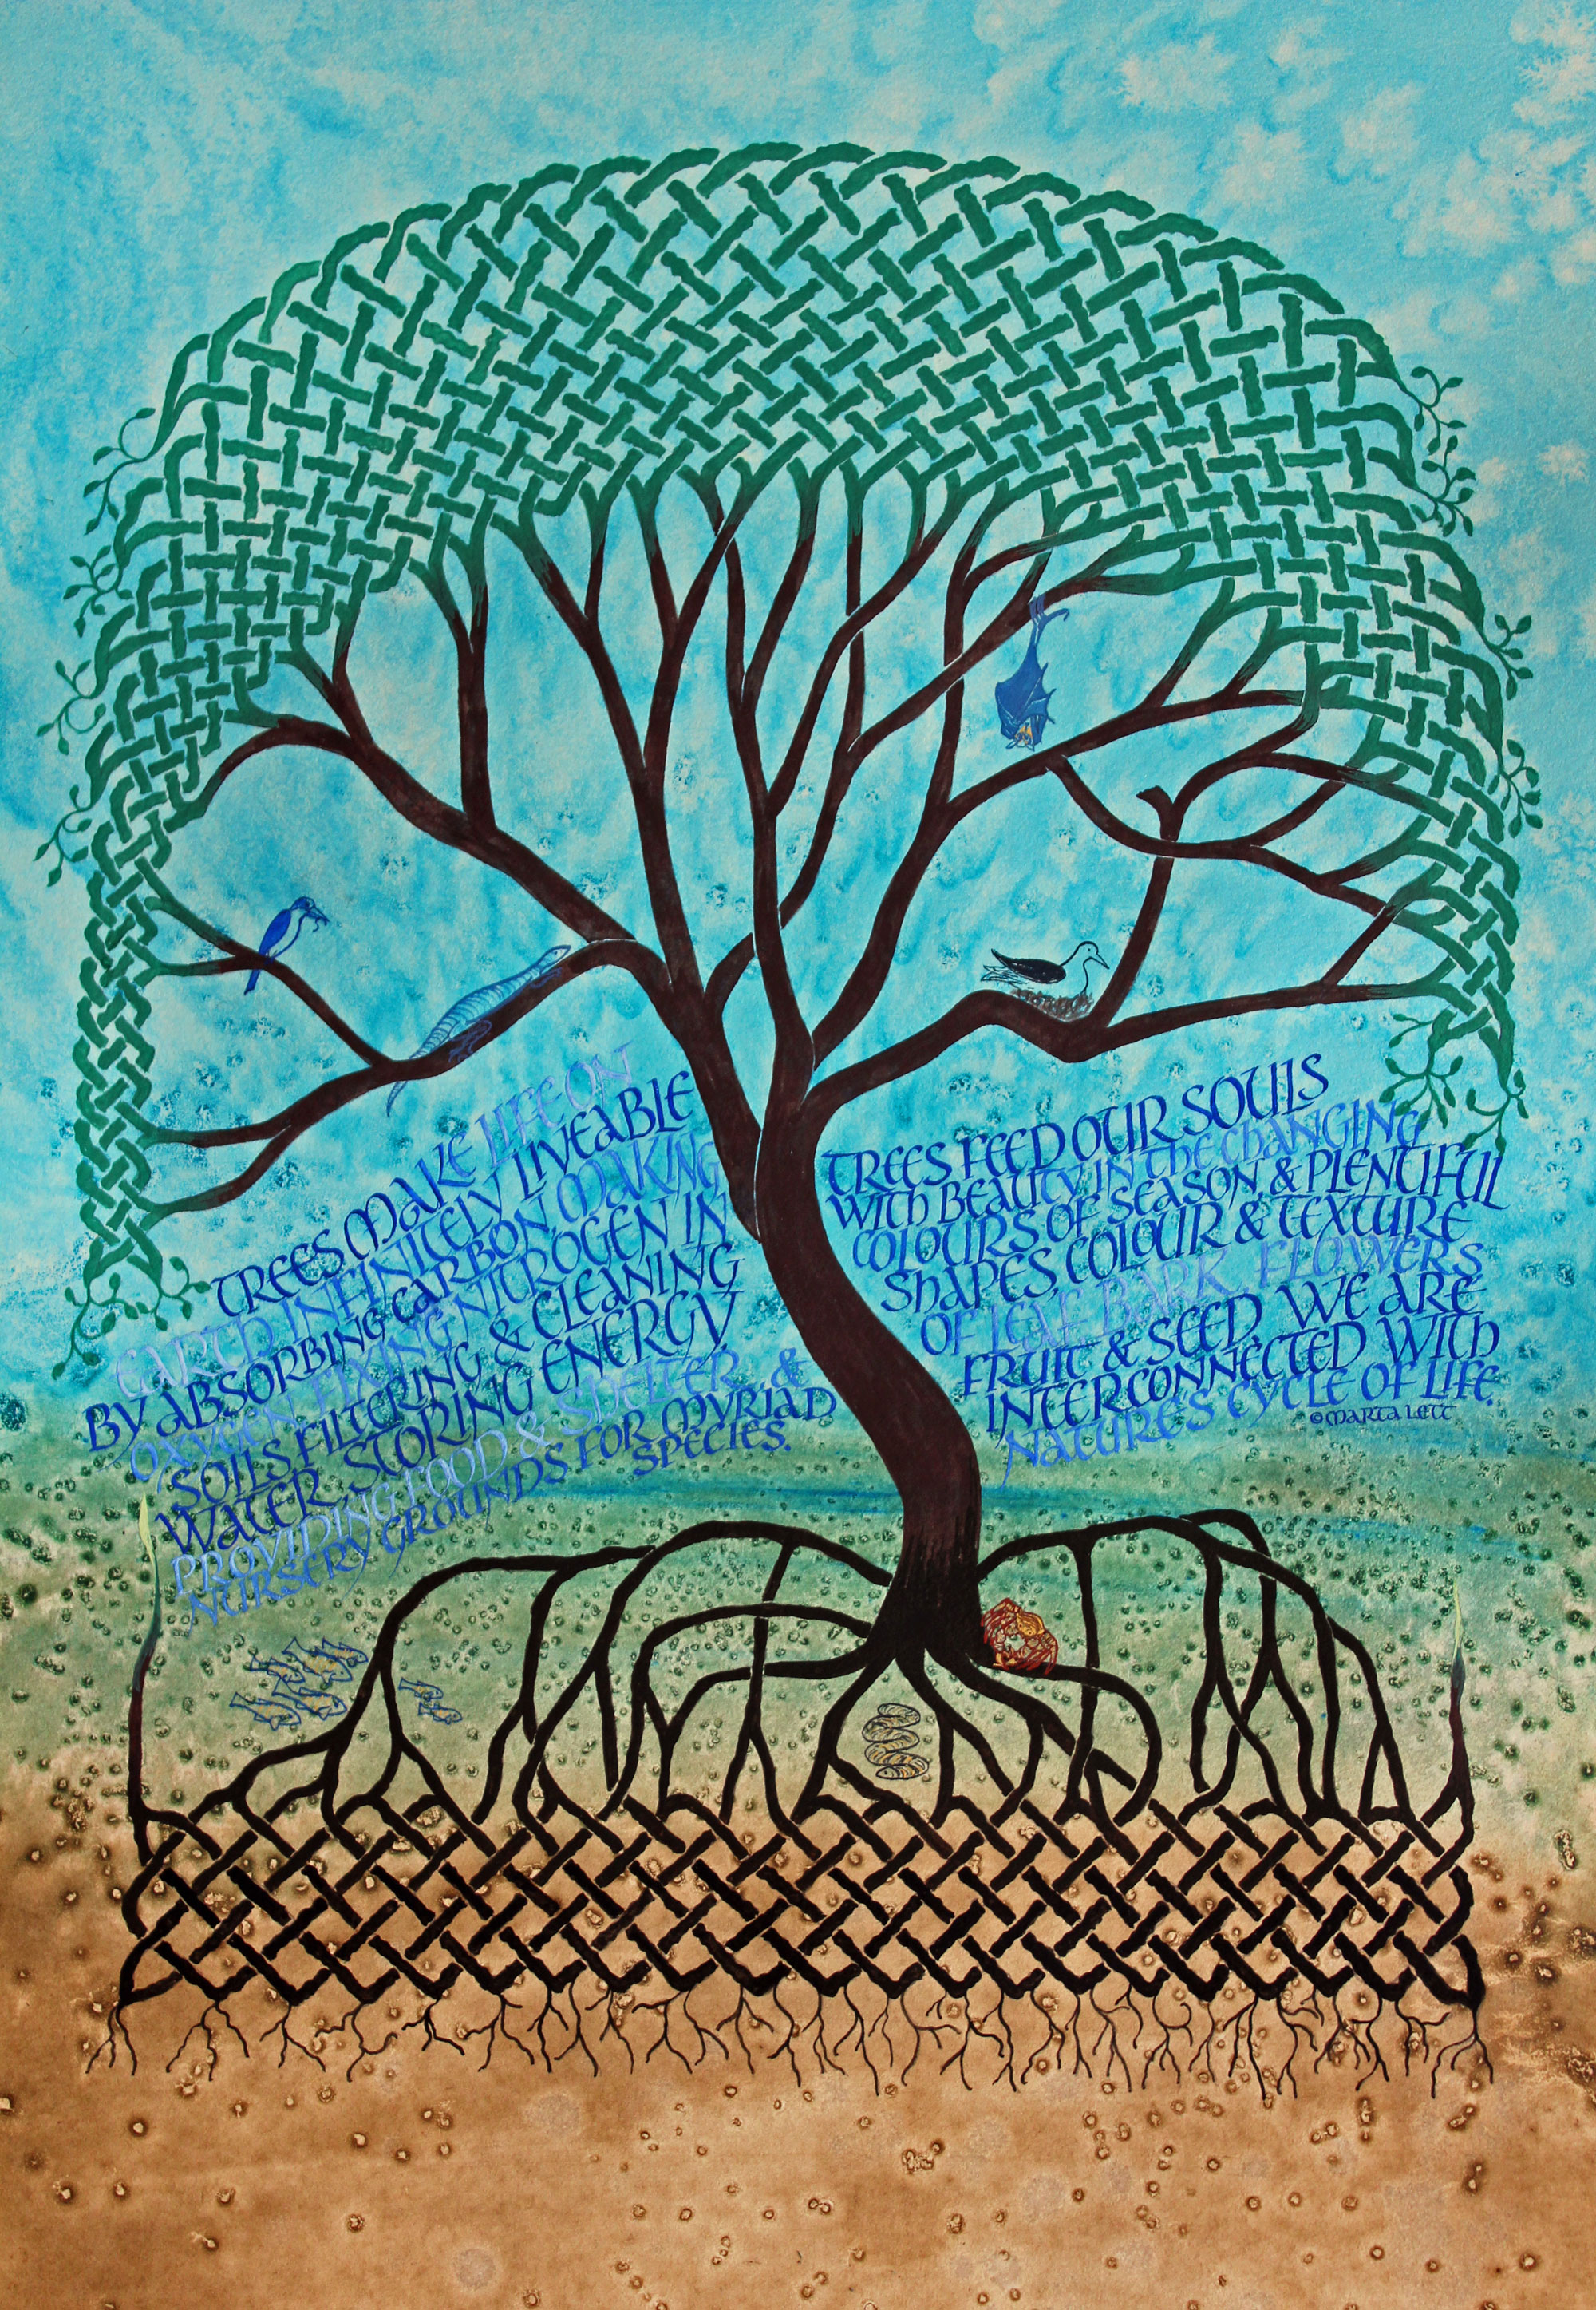 Tree of Life - Mangrove